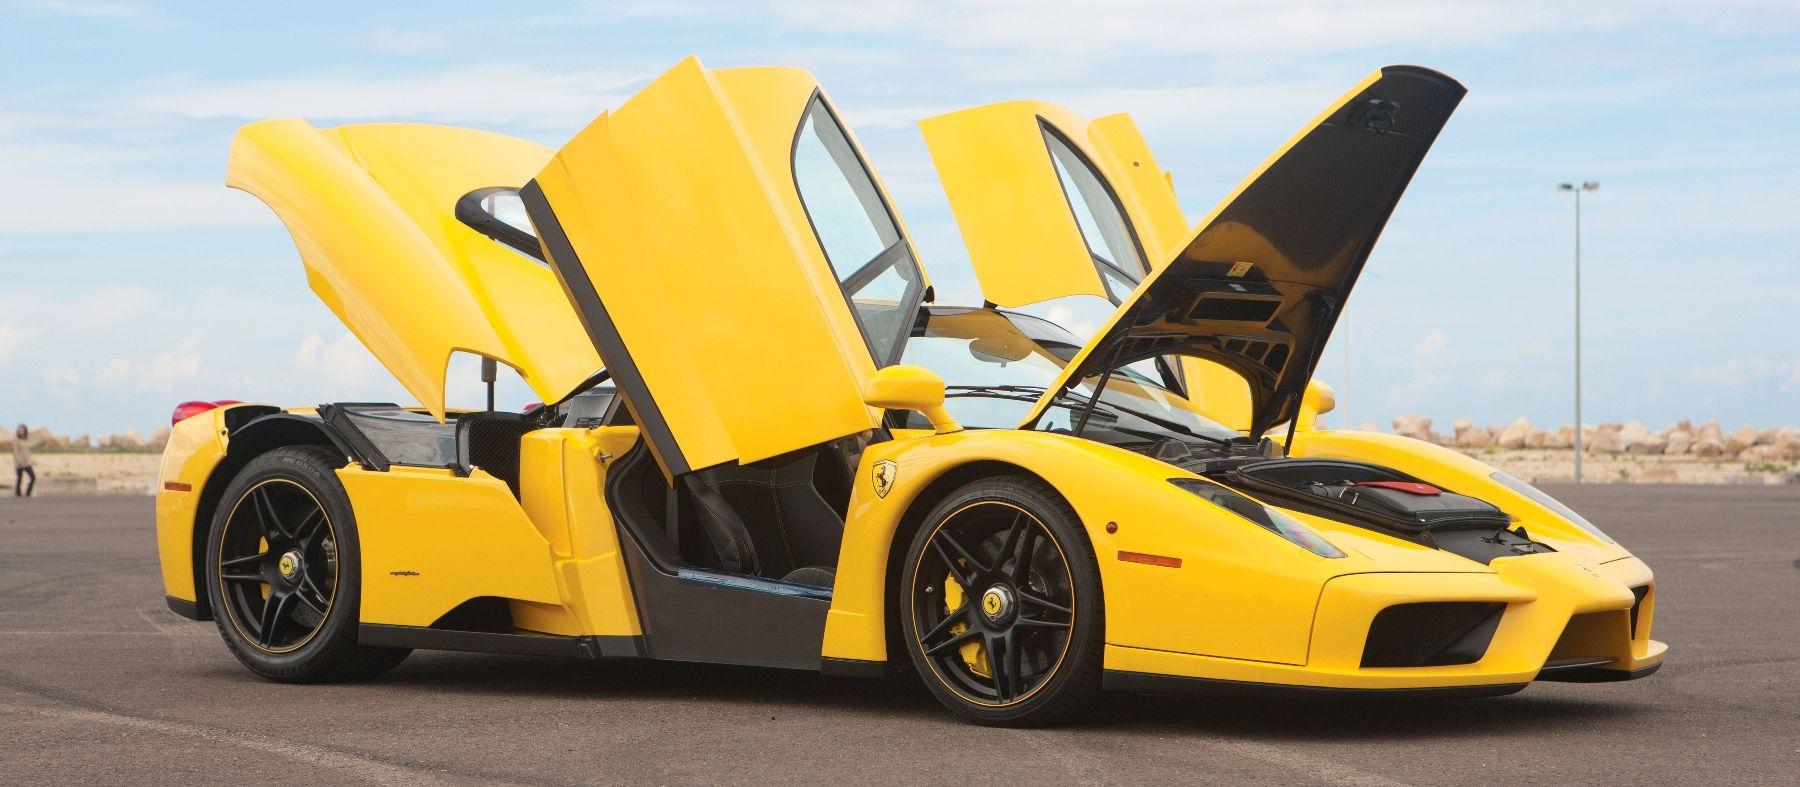 Rm Monaco 2014 Ferrari Enzo Yellow Over Black Ferrari Ferrari Enzo Yellow Car